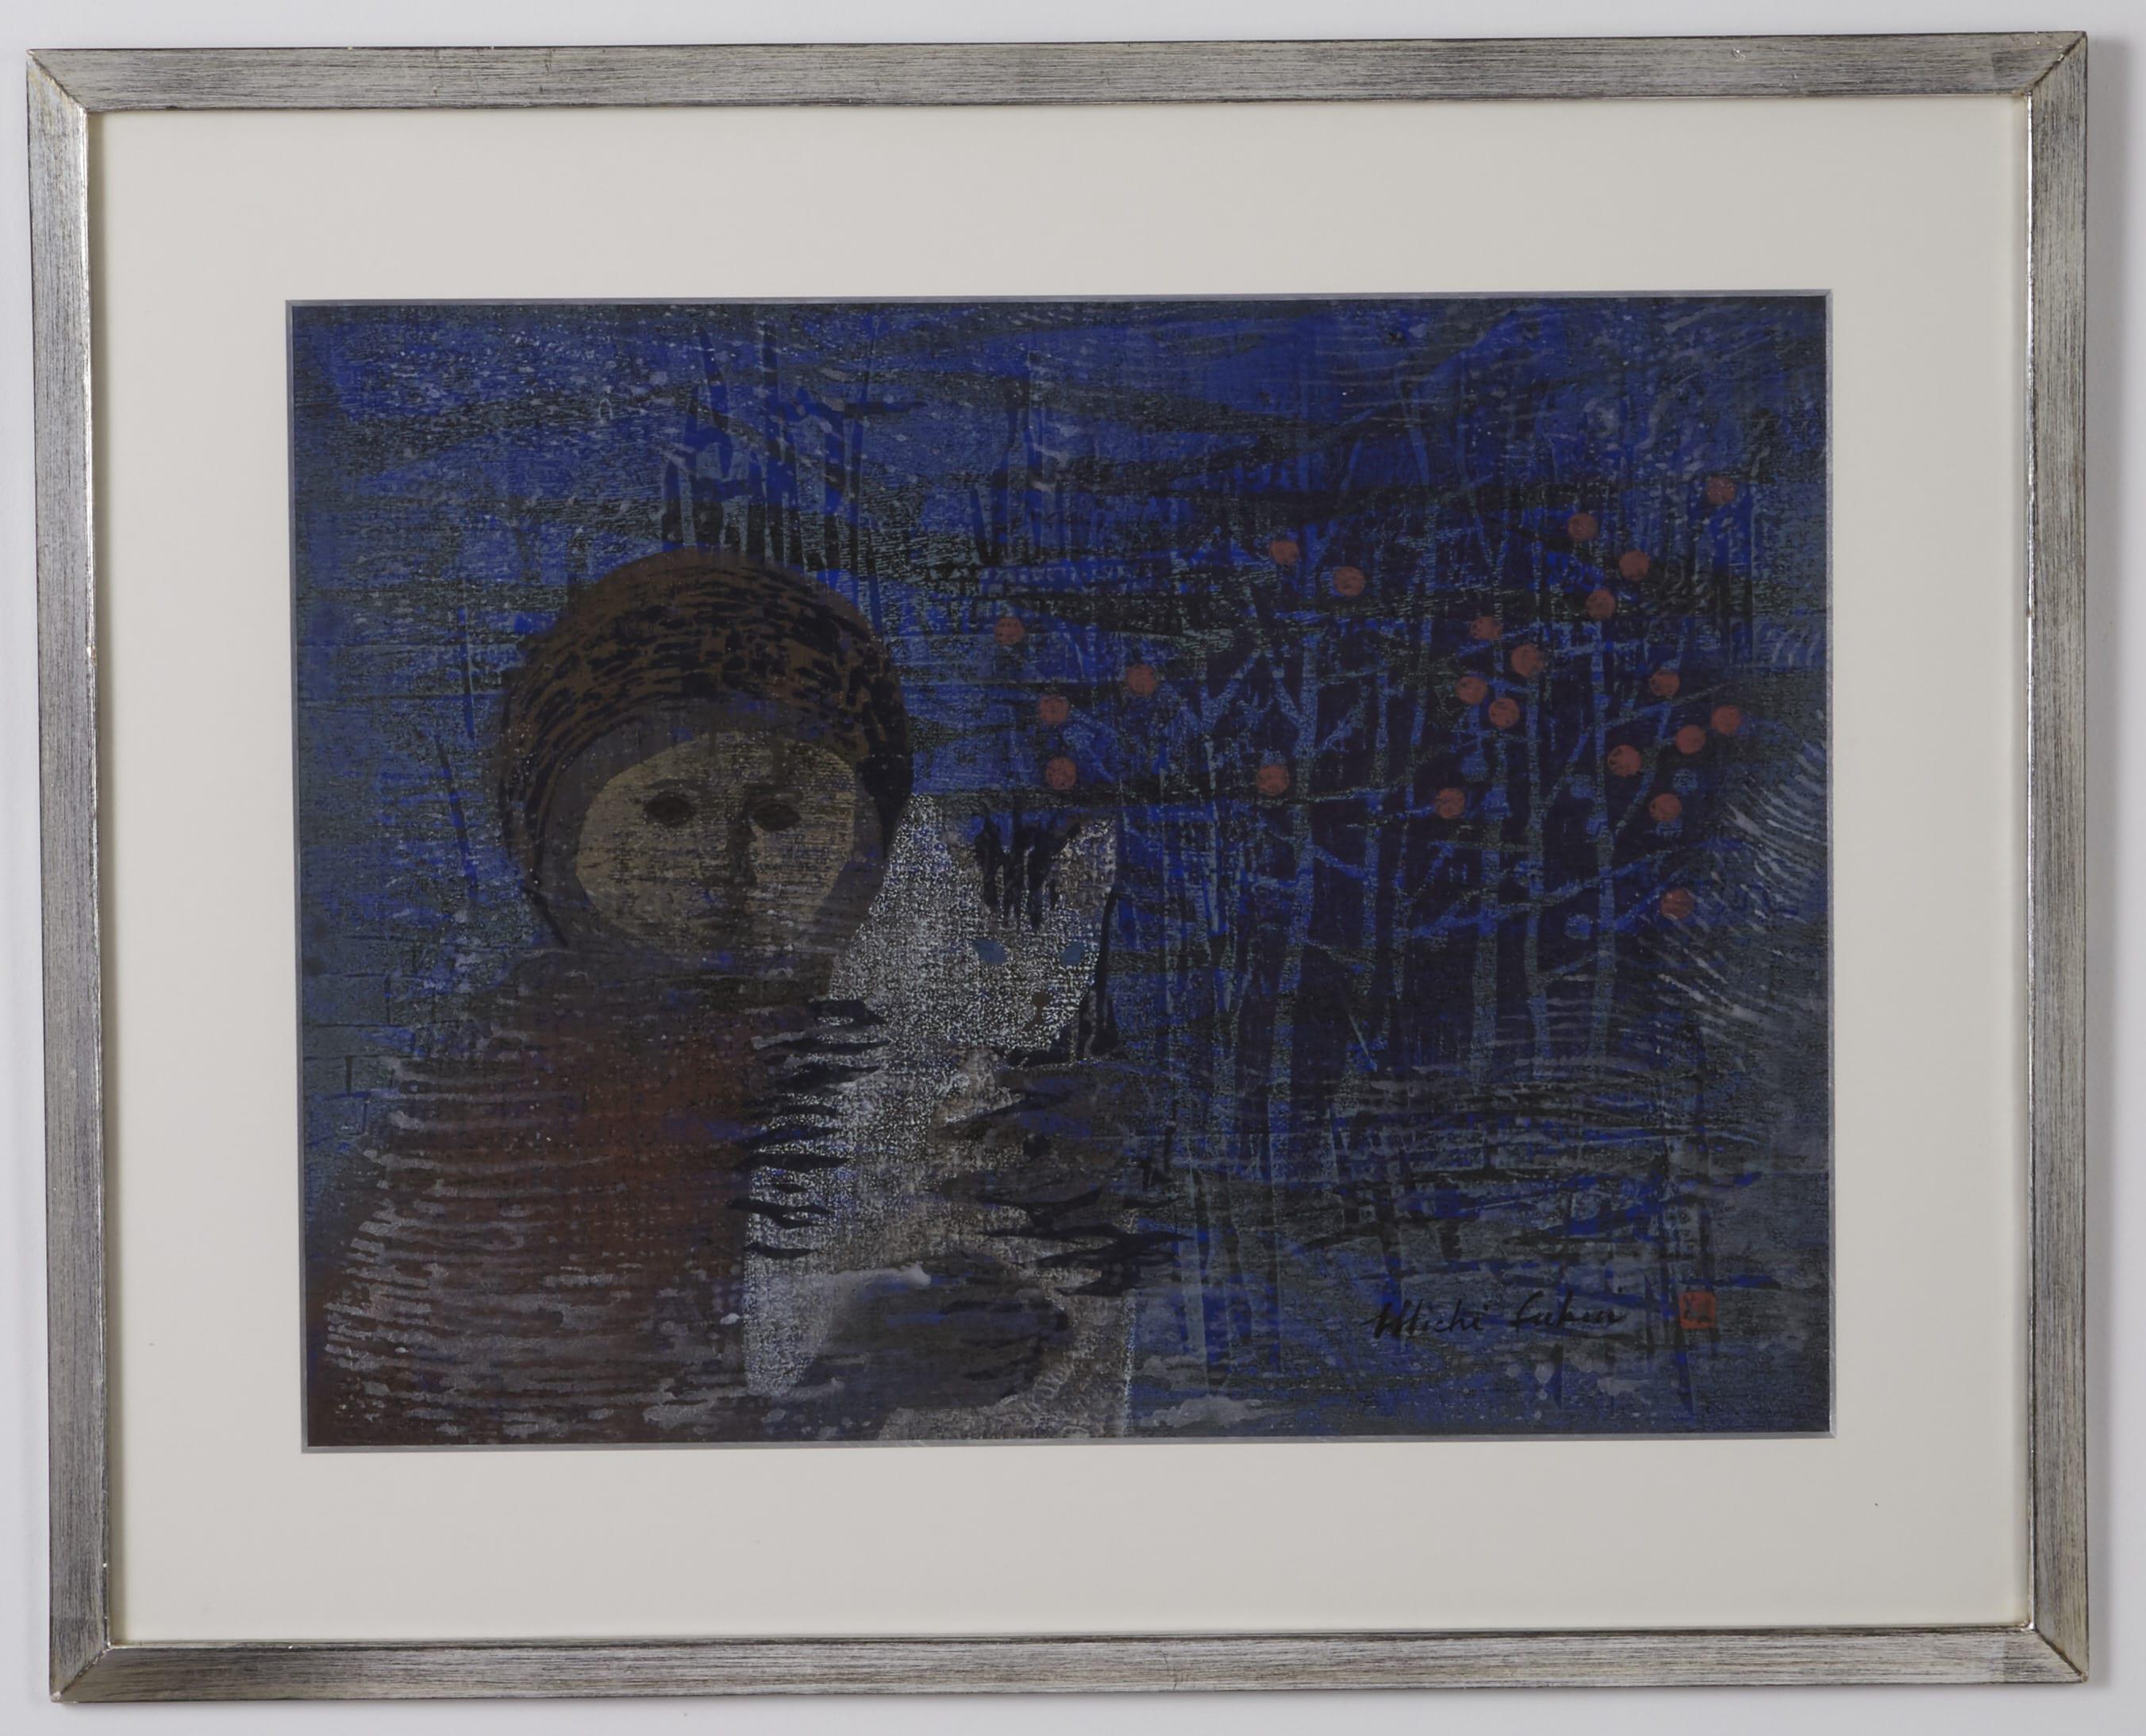 Lot 096: Michi Fukui Woodblock Print with Girl and Cat